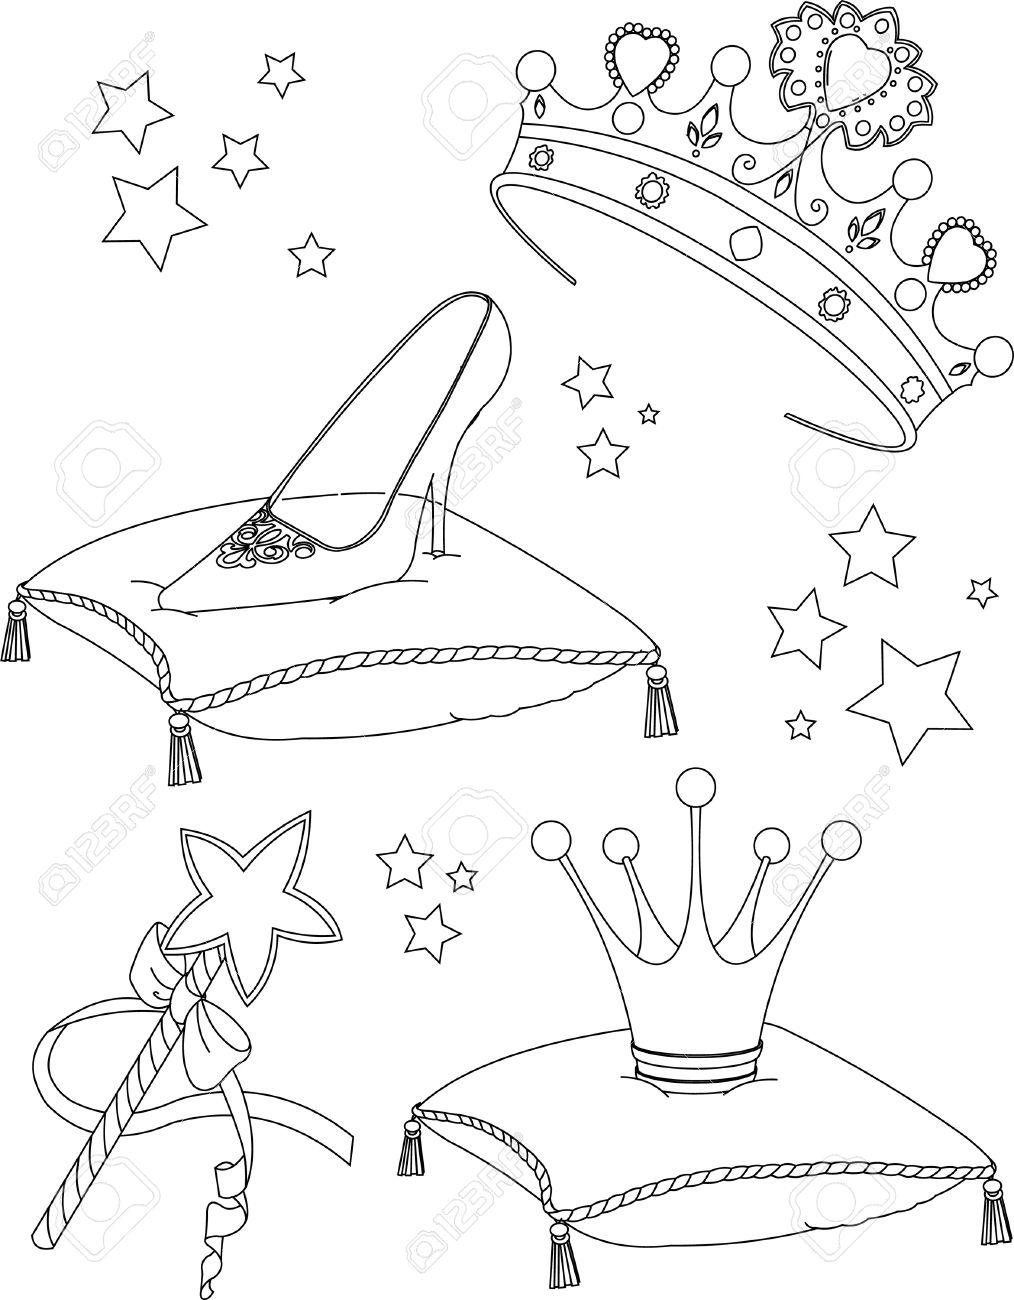 Beautiful Princess Collectibles Coloring Page Royalty Free Cliparts ...